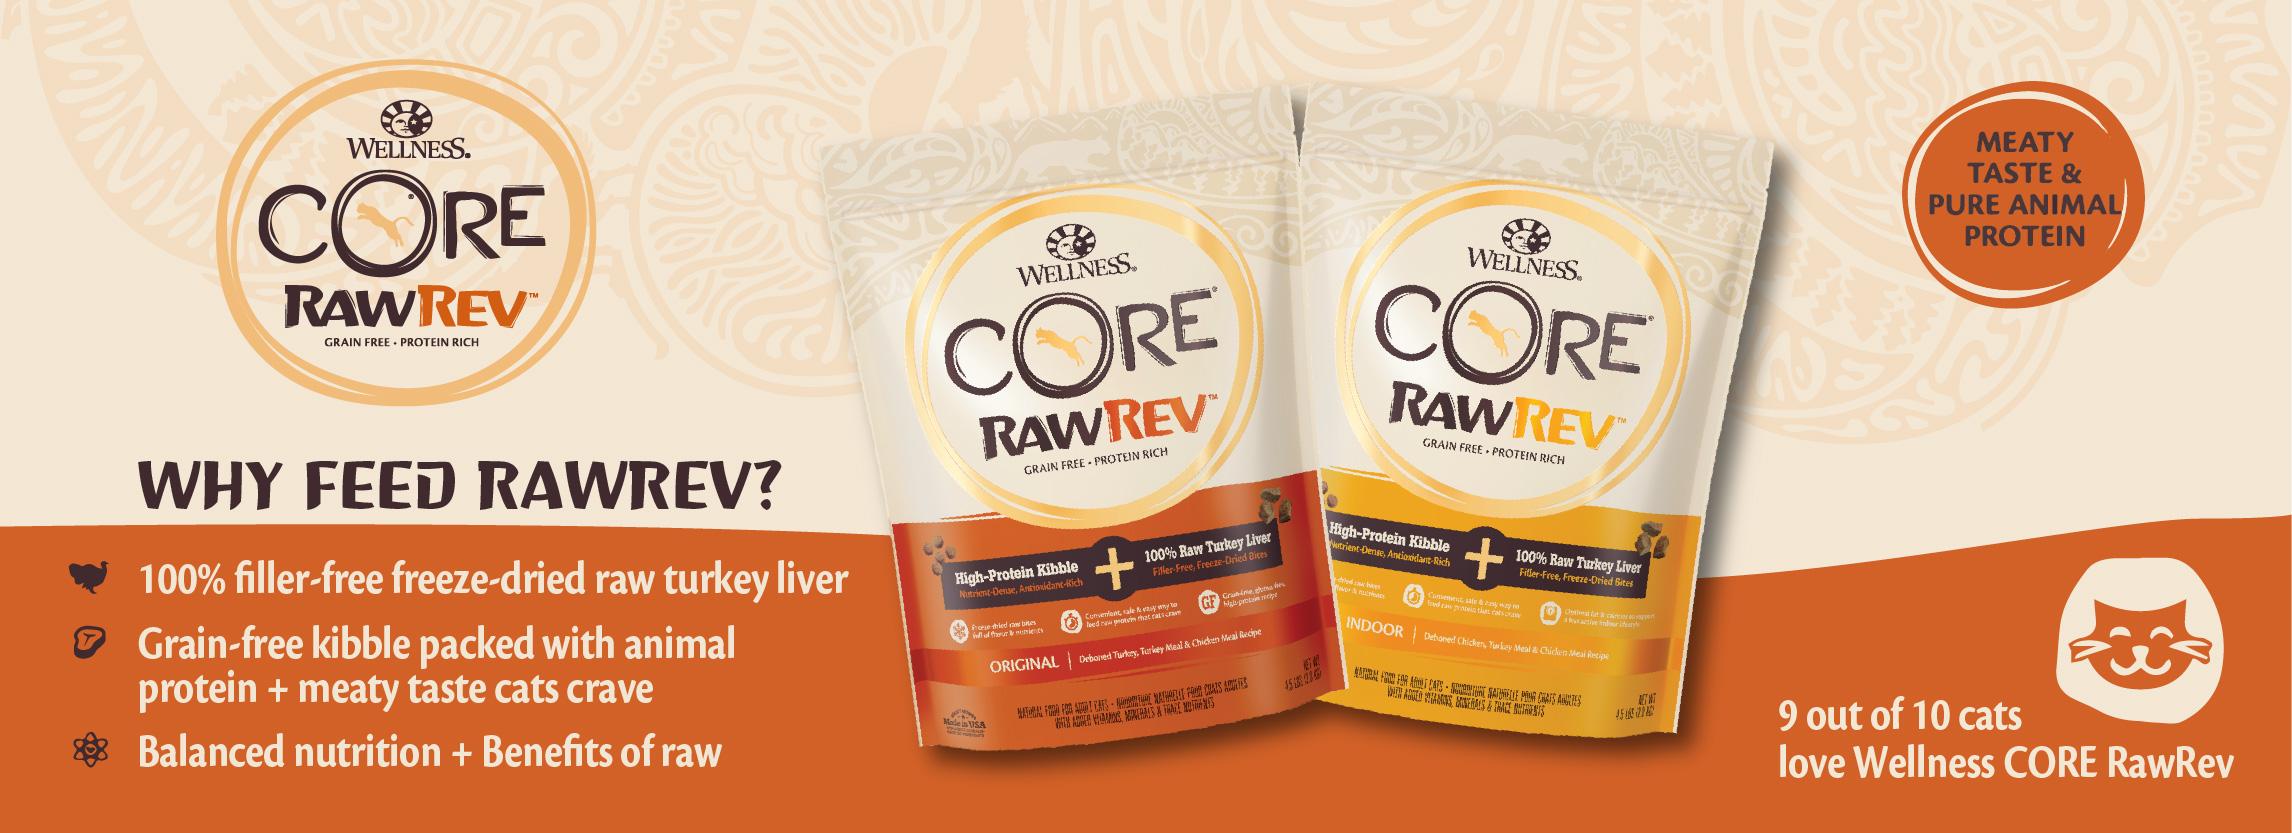 Wellness CORE RawRev Cat_Banner